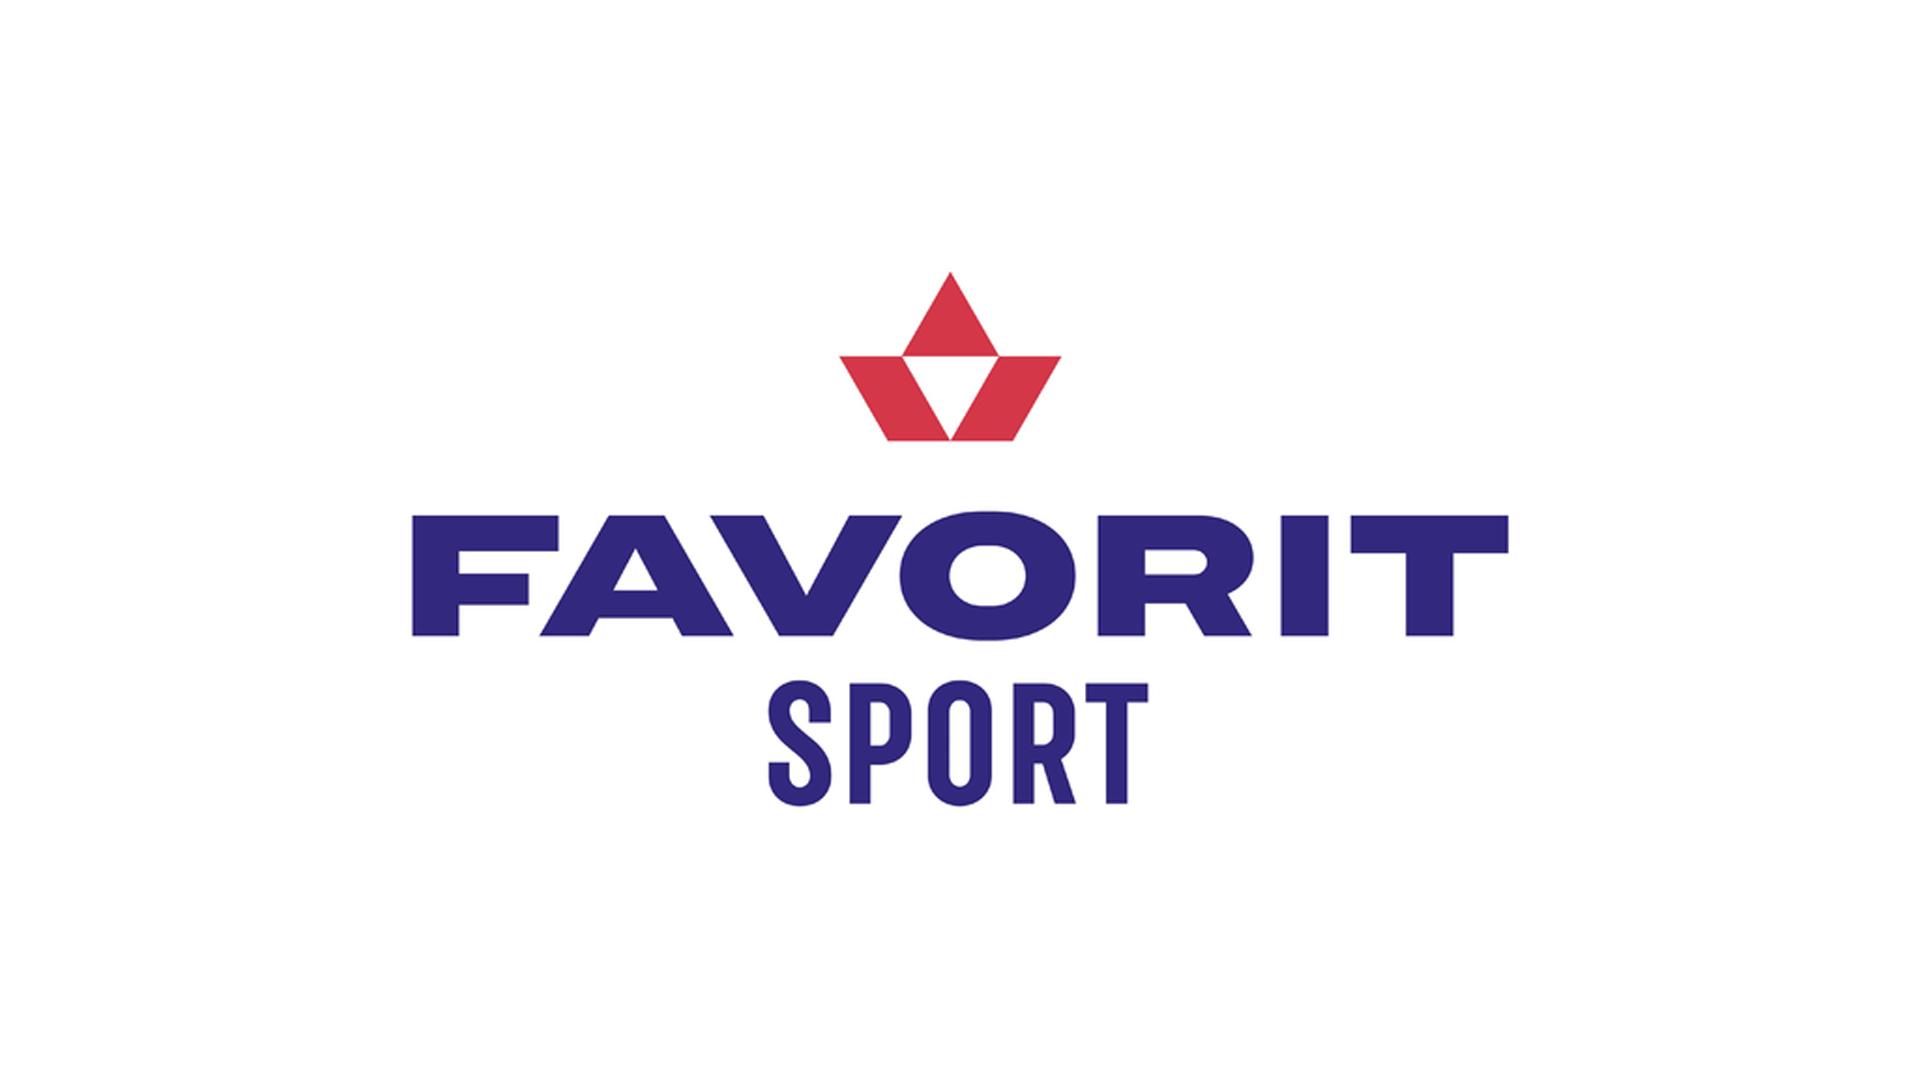 Favorite Sport Ukraine